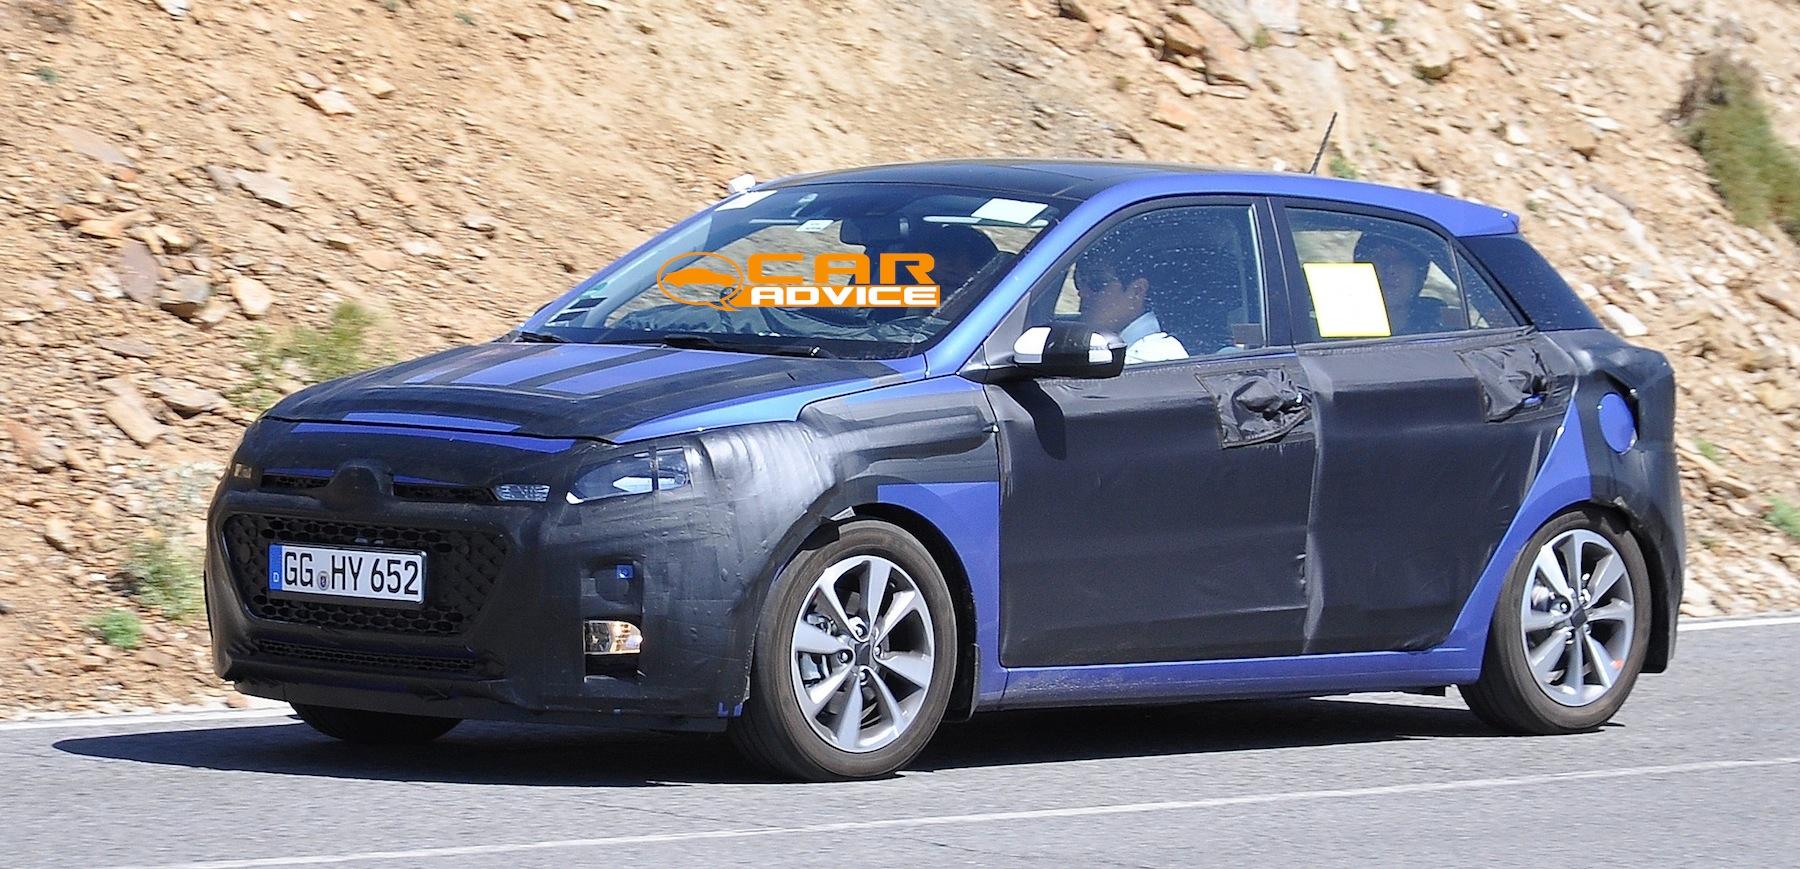 2016 Hyundai Santa Fe >> Hyundai i20: second-gen city car spied with less camouflage - photos   CarAdvice